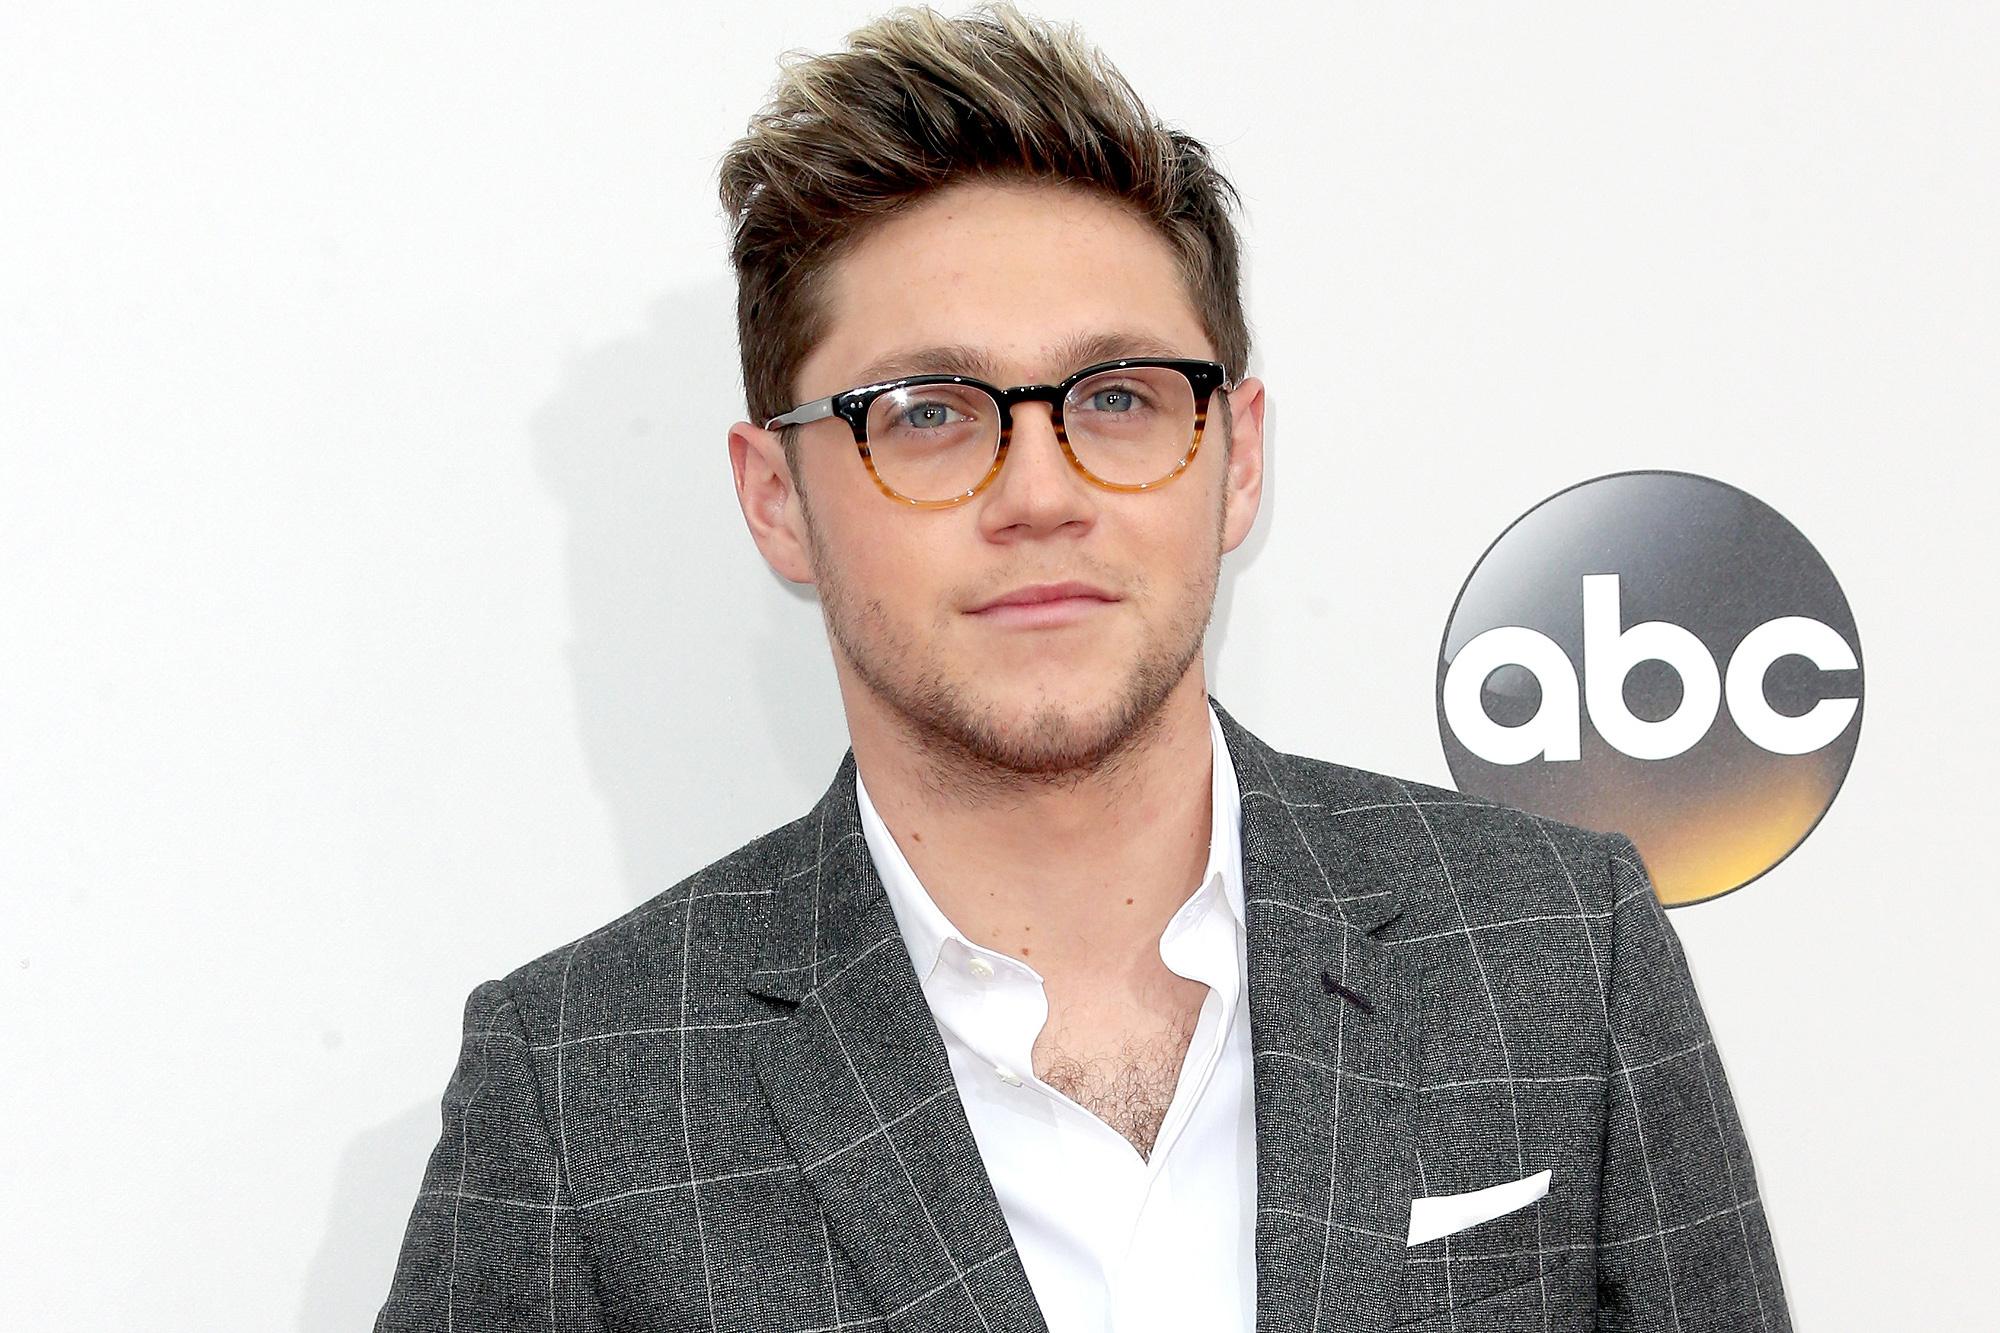 Niall Horan dating married career girlfriend net worth wiki